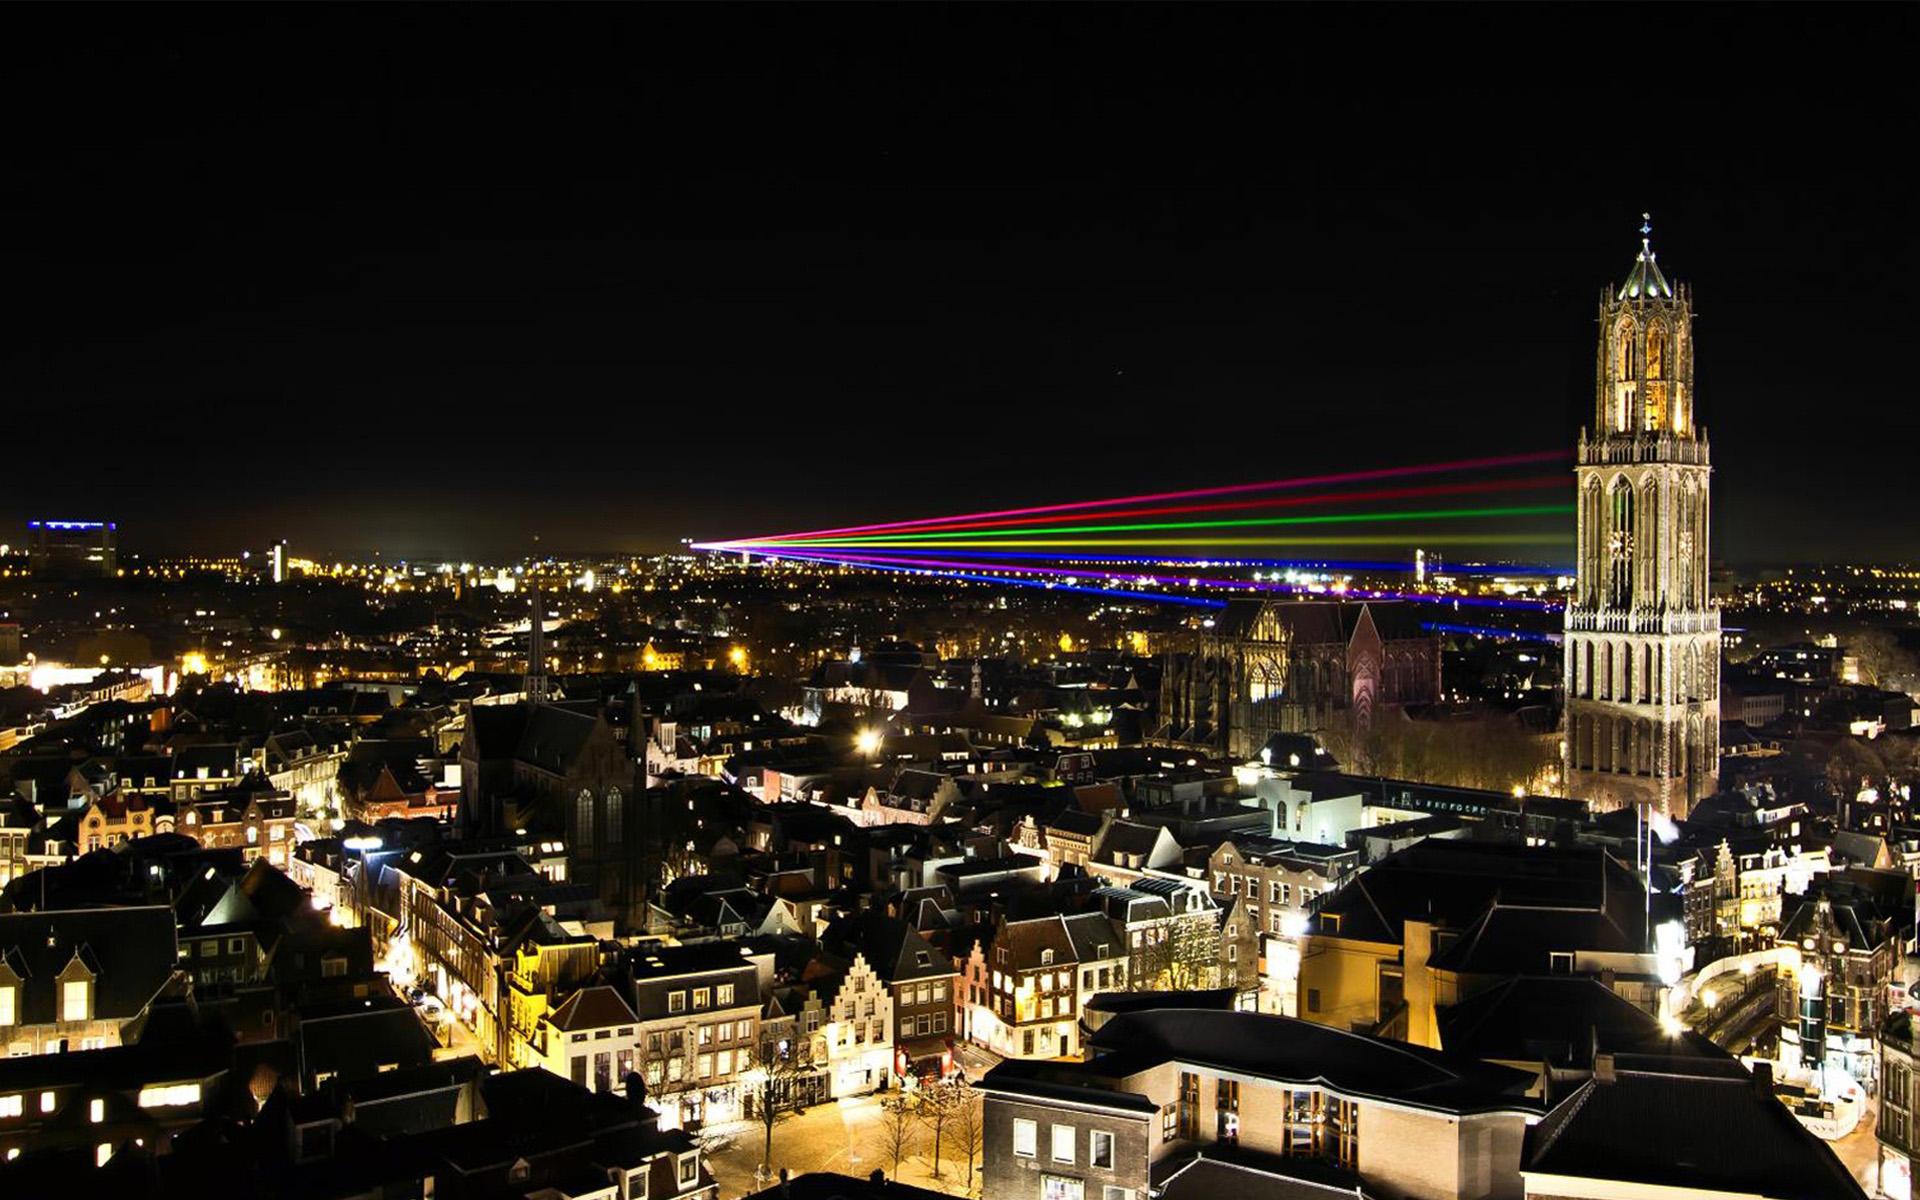 Utrecht City Night Wallpaper - Utrecht City Night Wallpaper